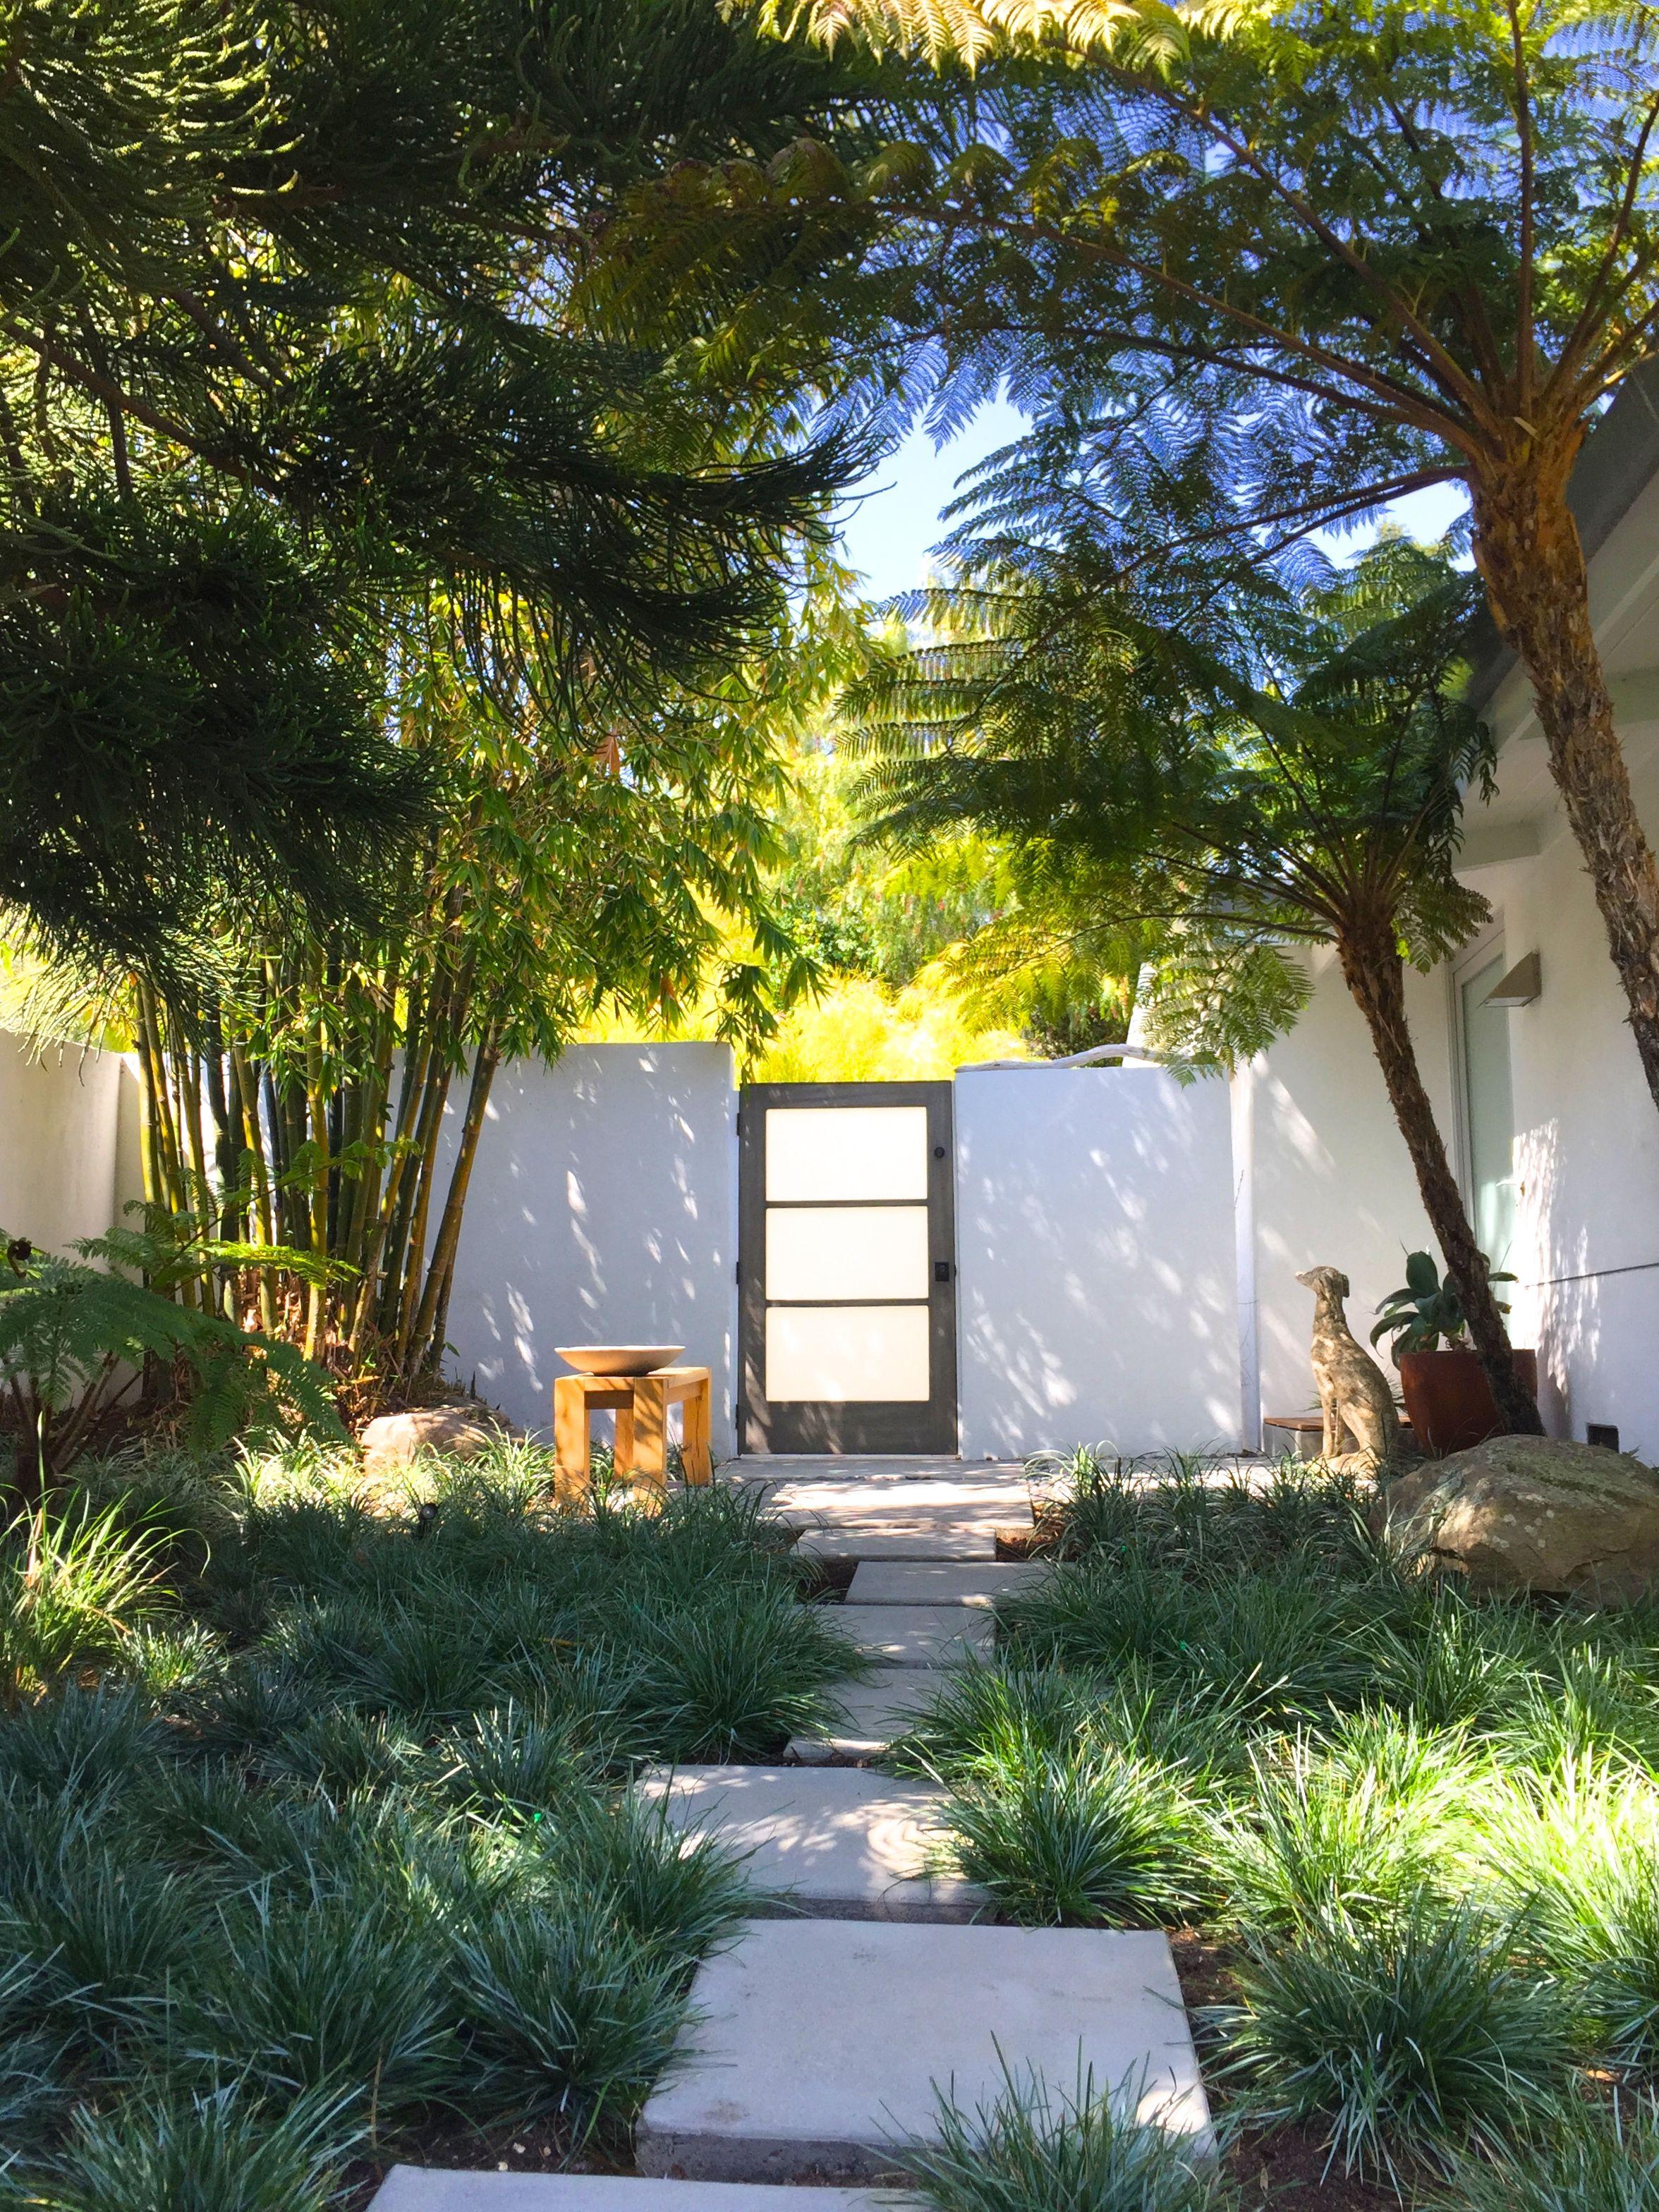 Modern garden house  imgg  pixels  The garden  Pinterest  Glass